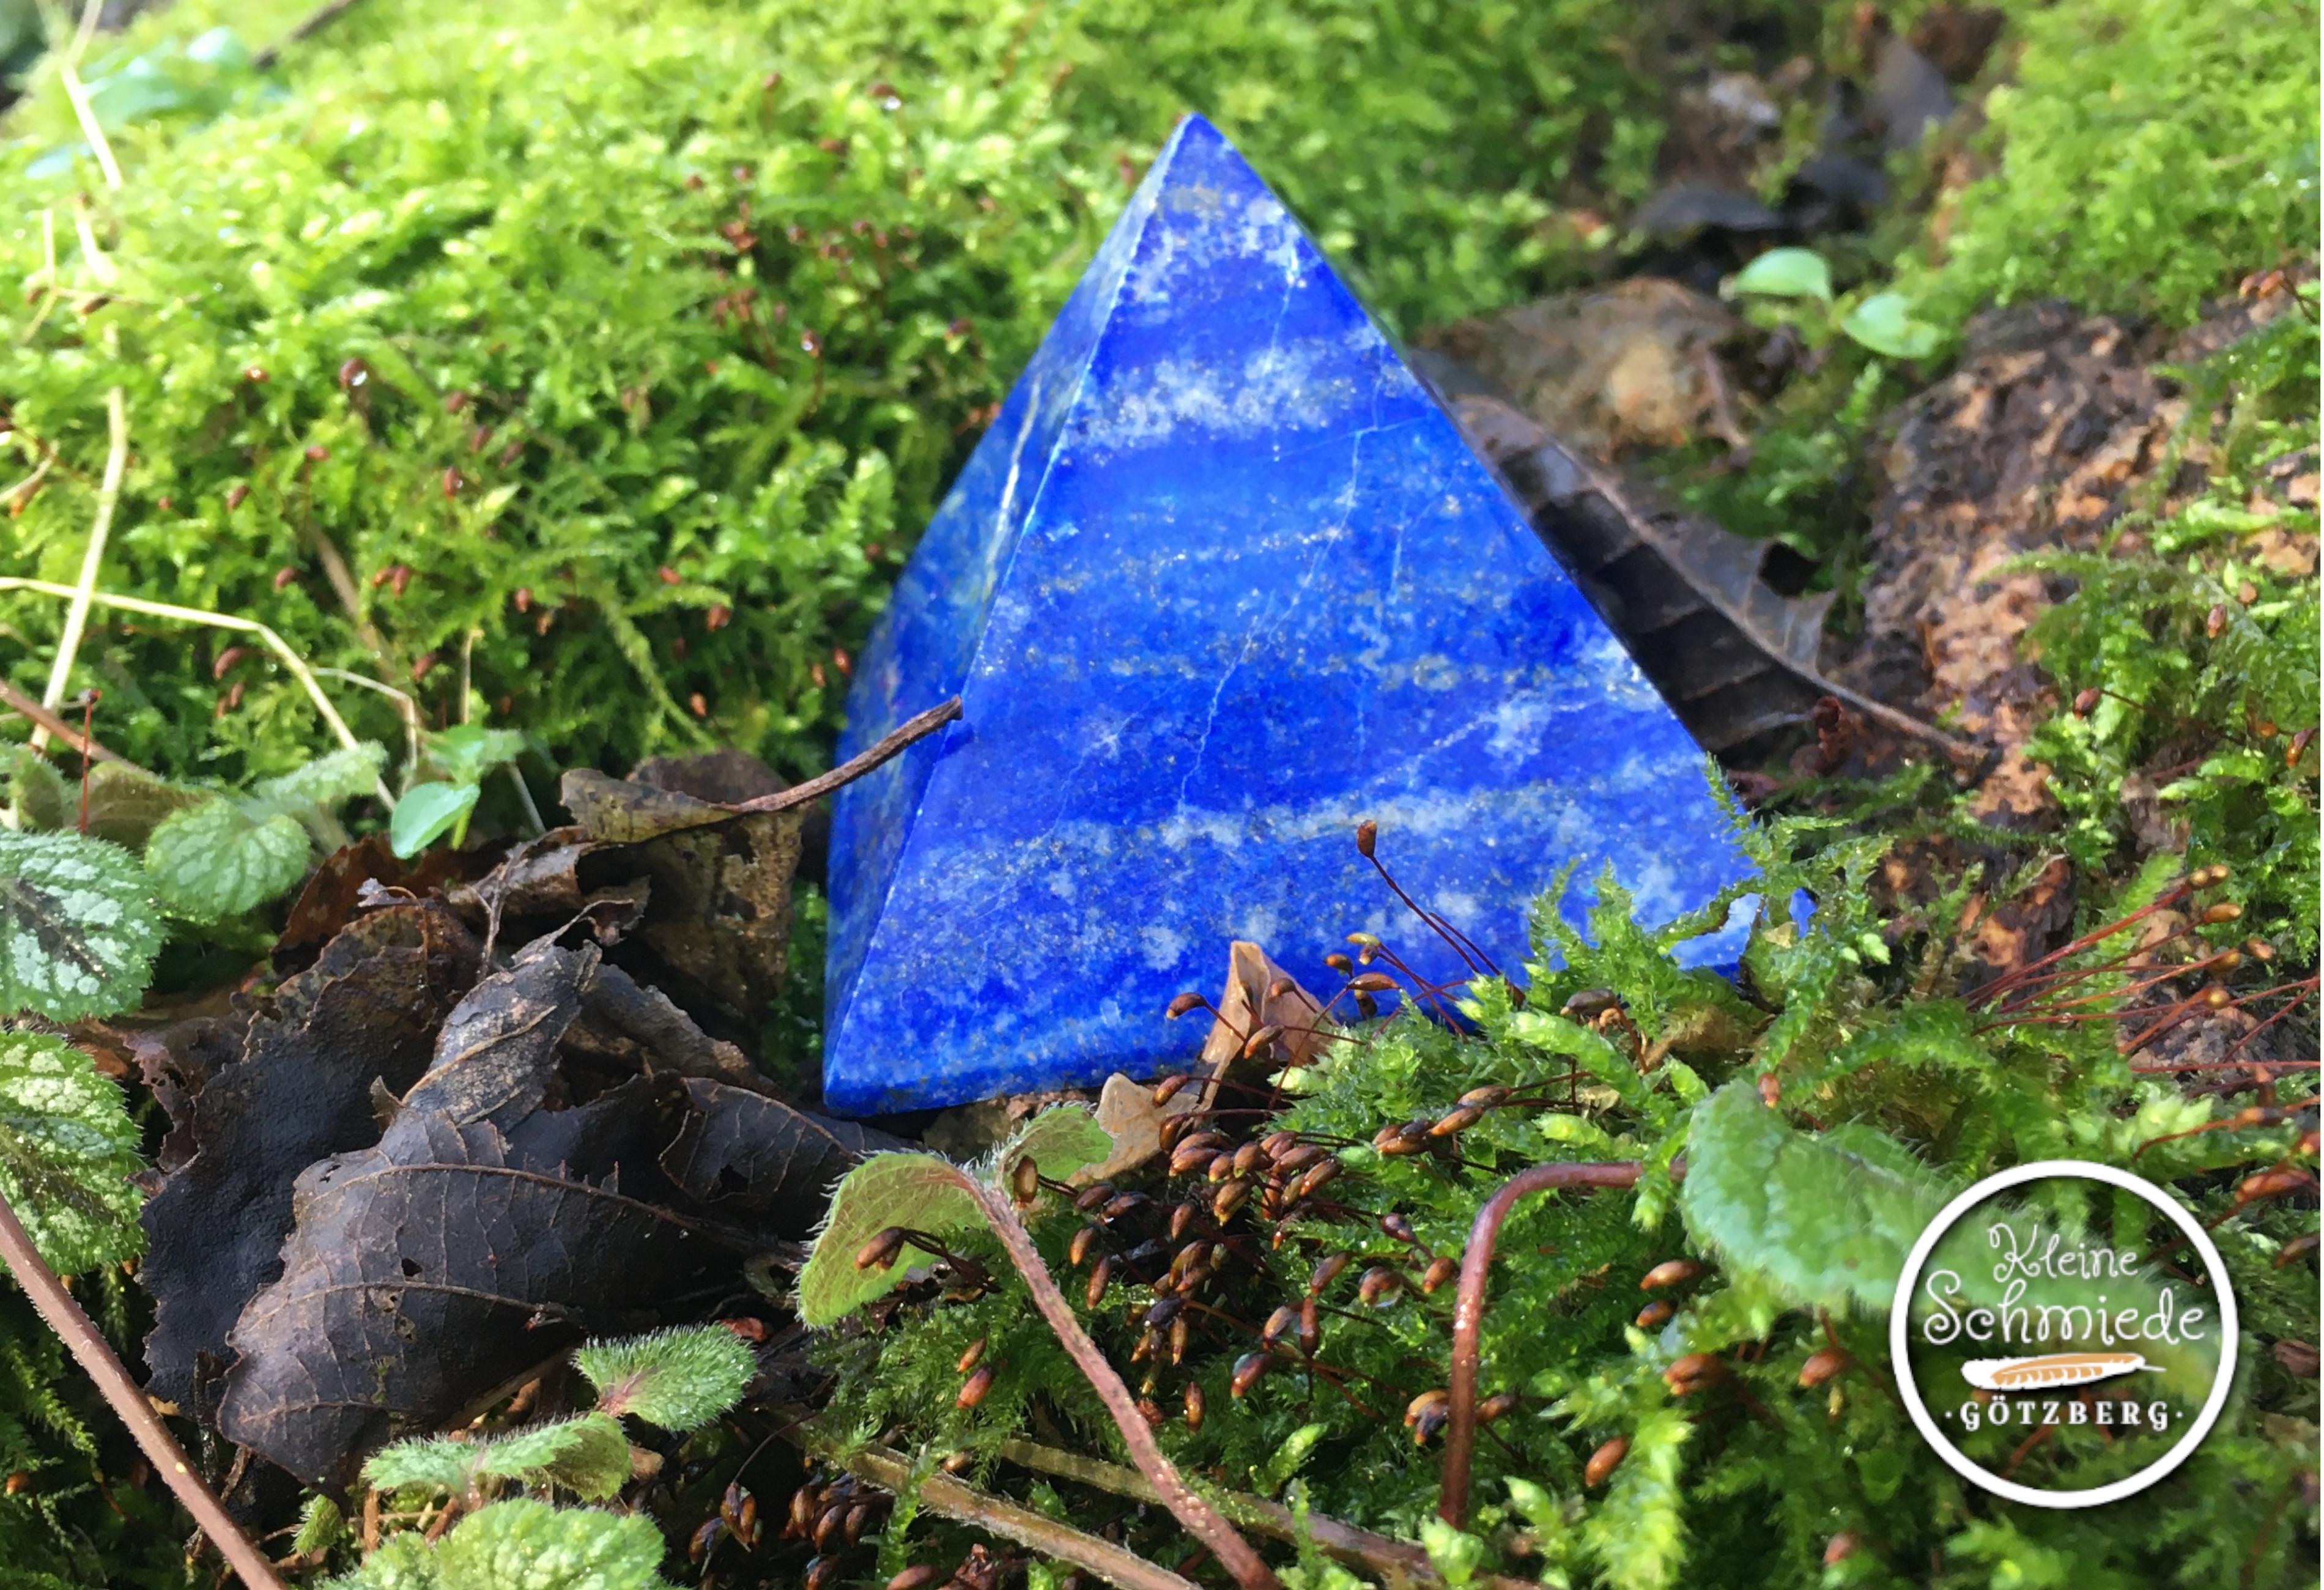 Lapislazuli-Pyramiden